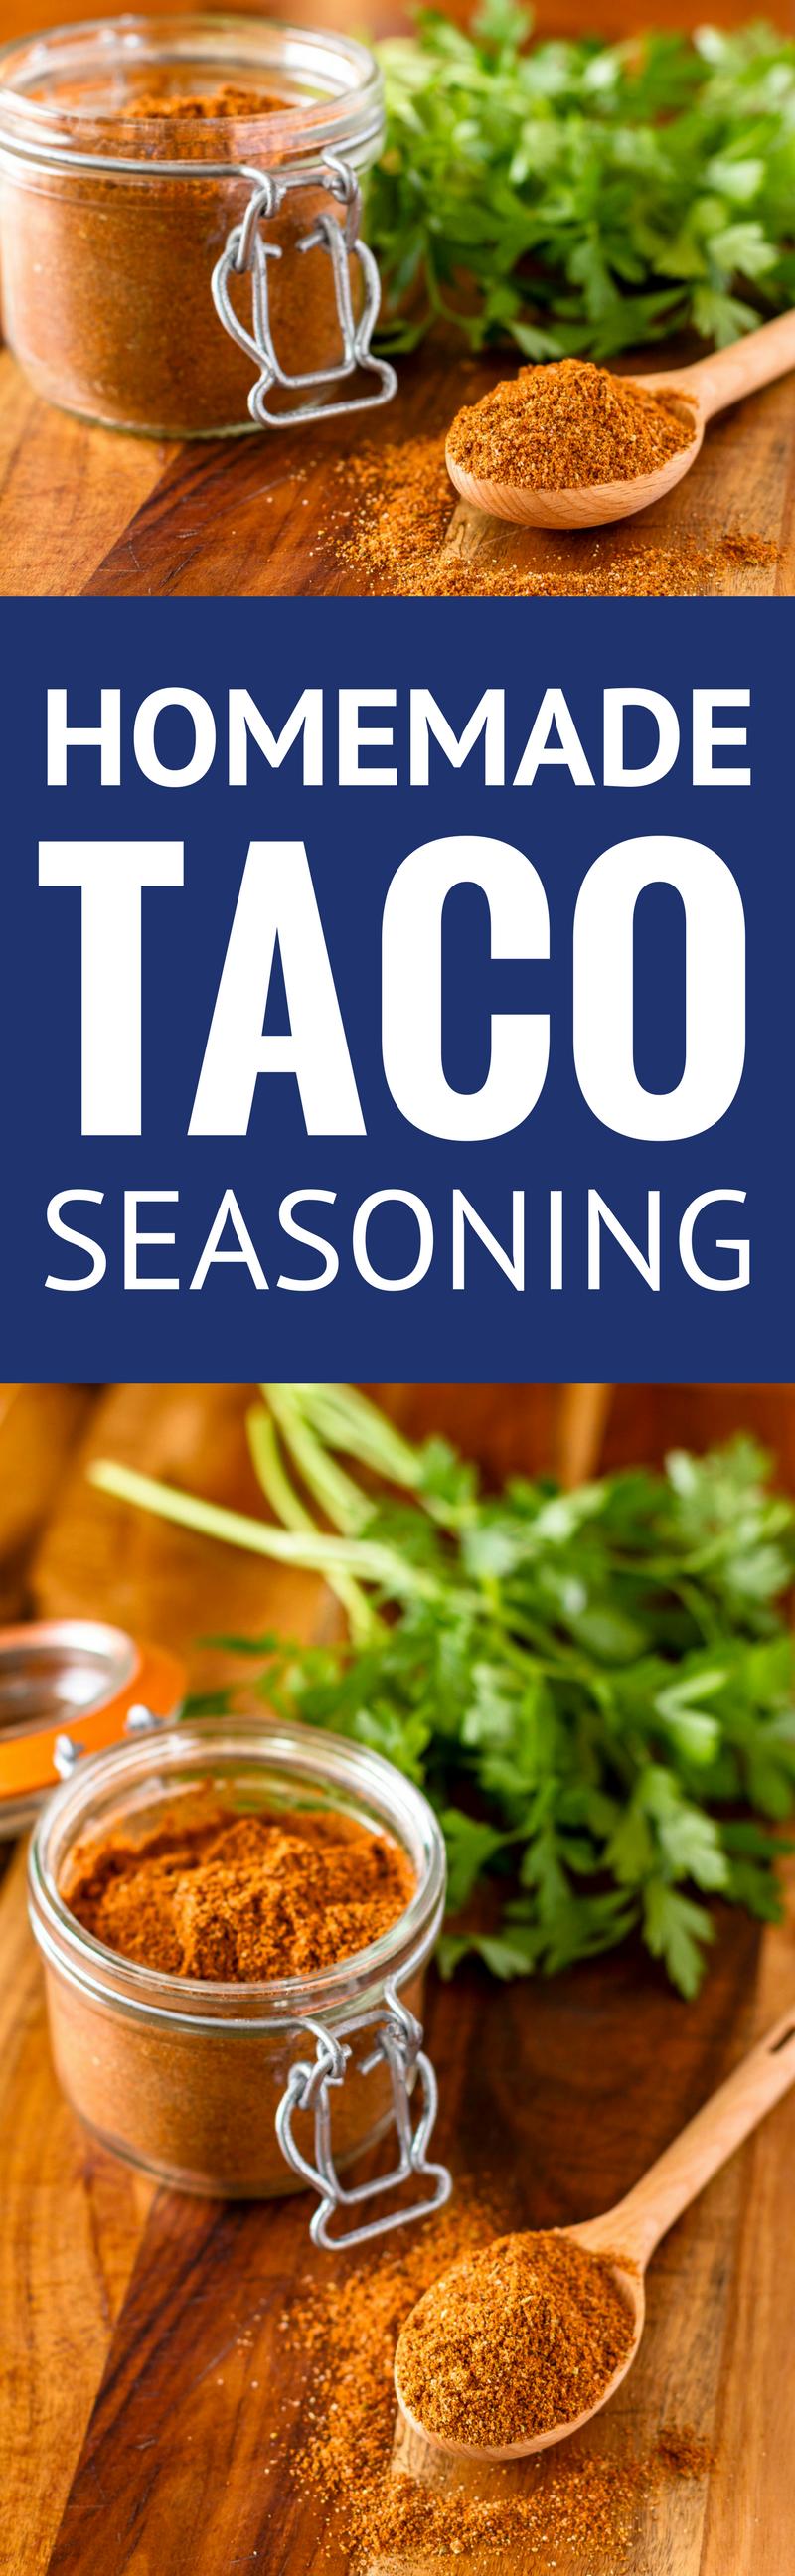 Homemade Taco Seasoning Mix make your own all purpose